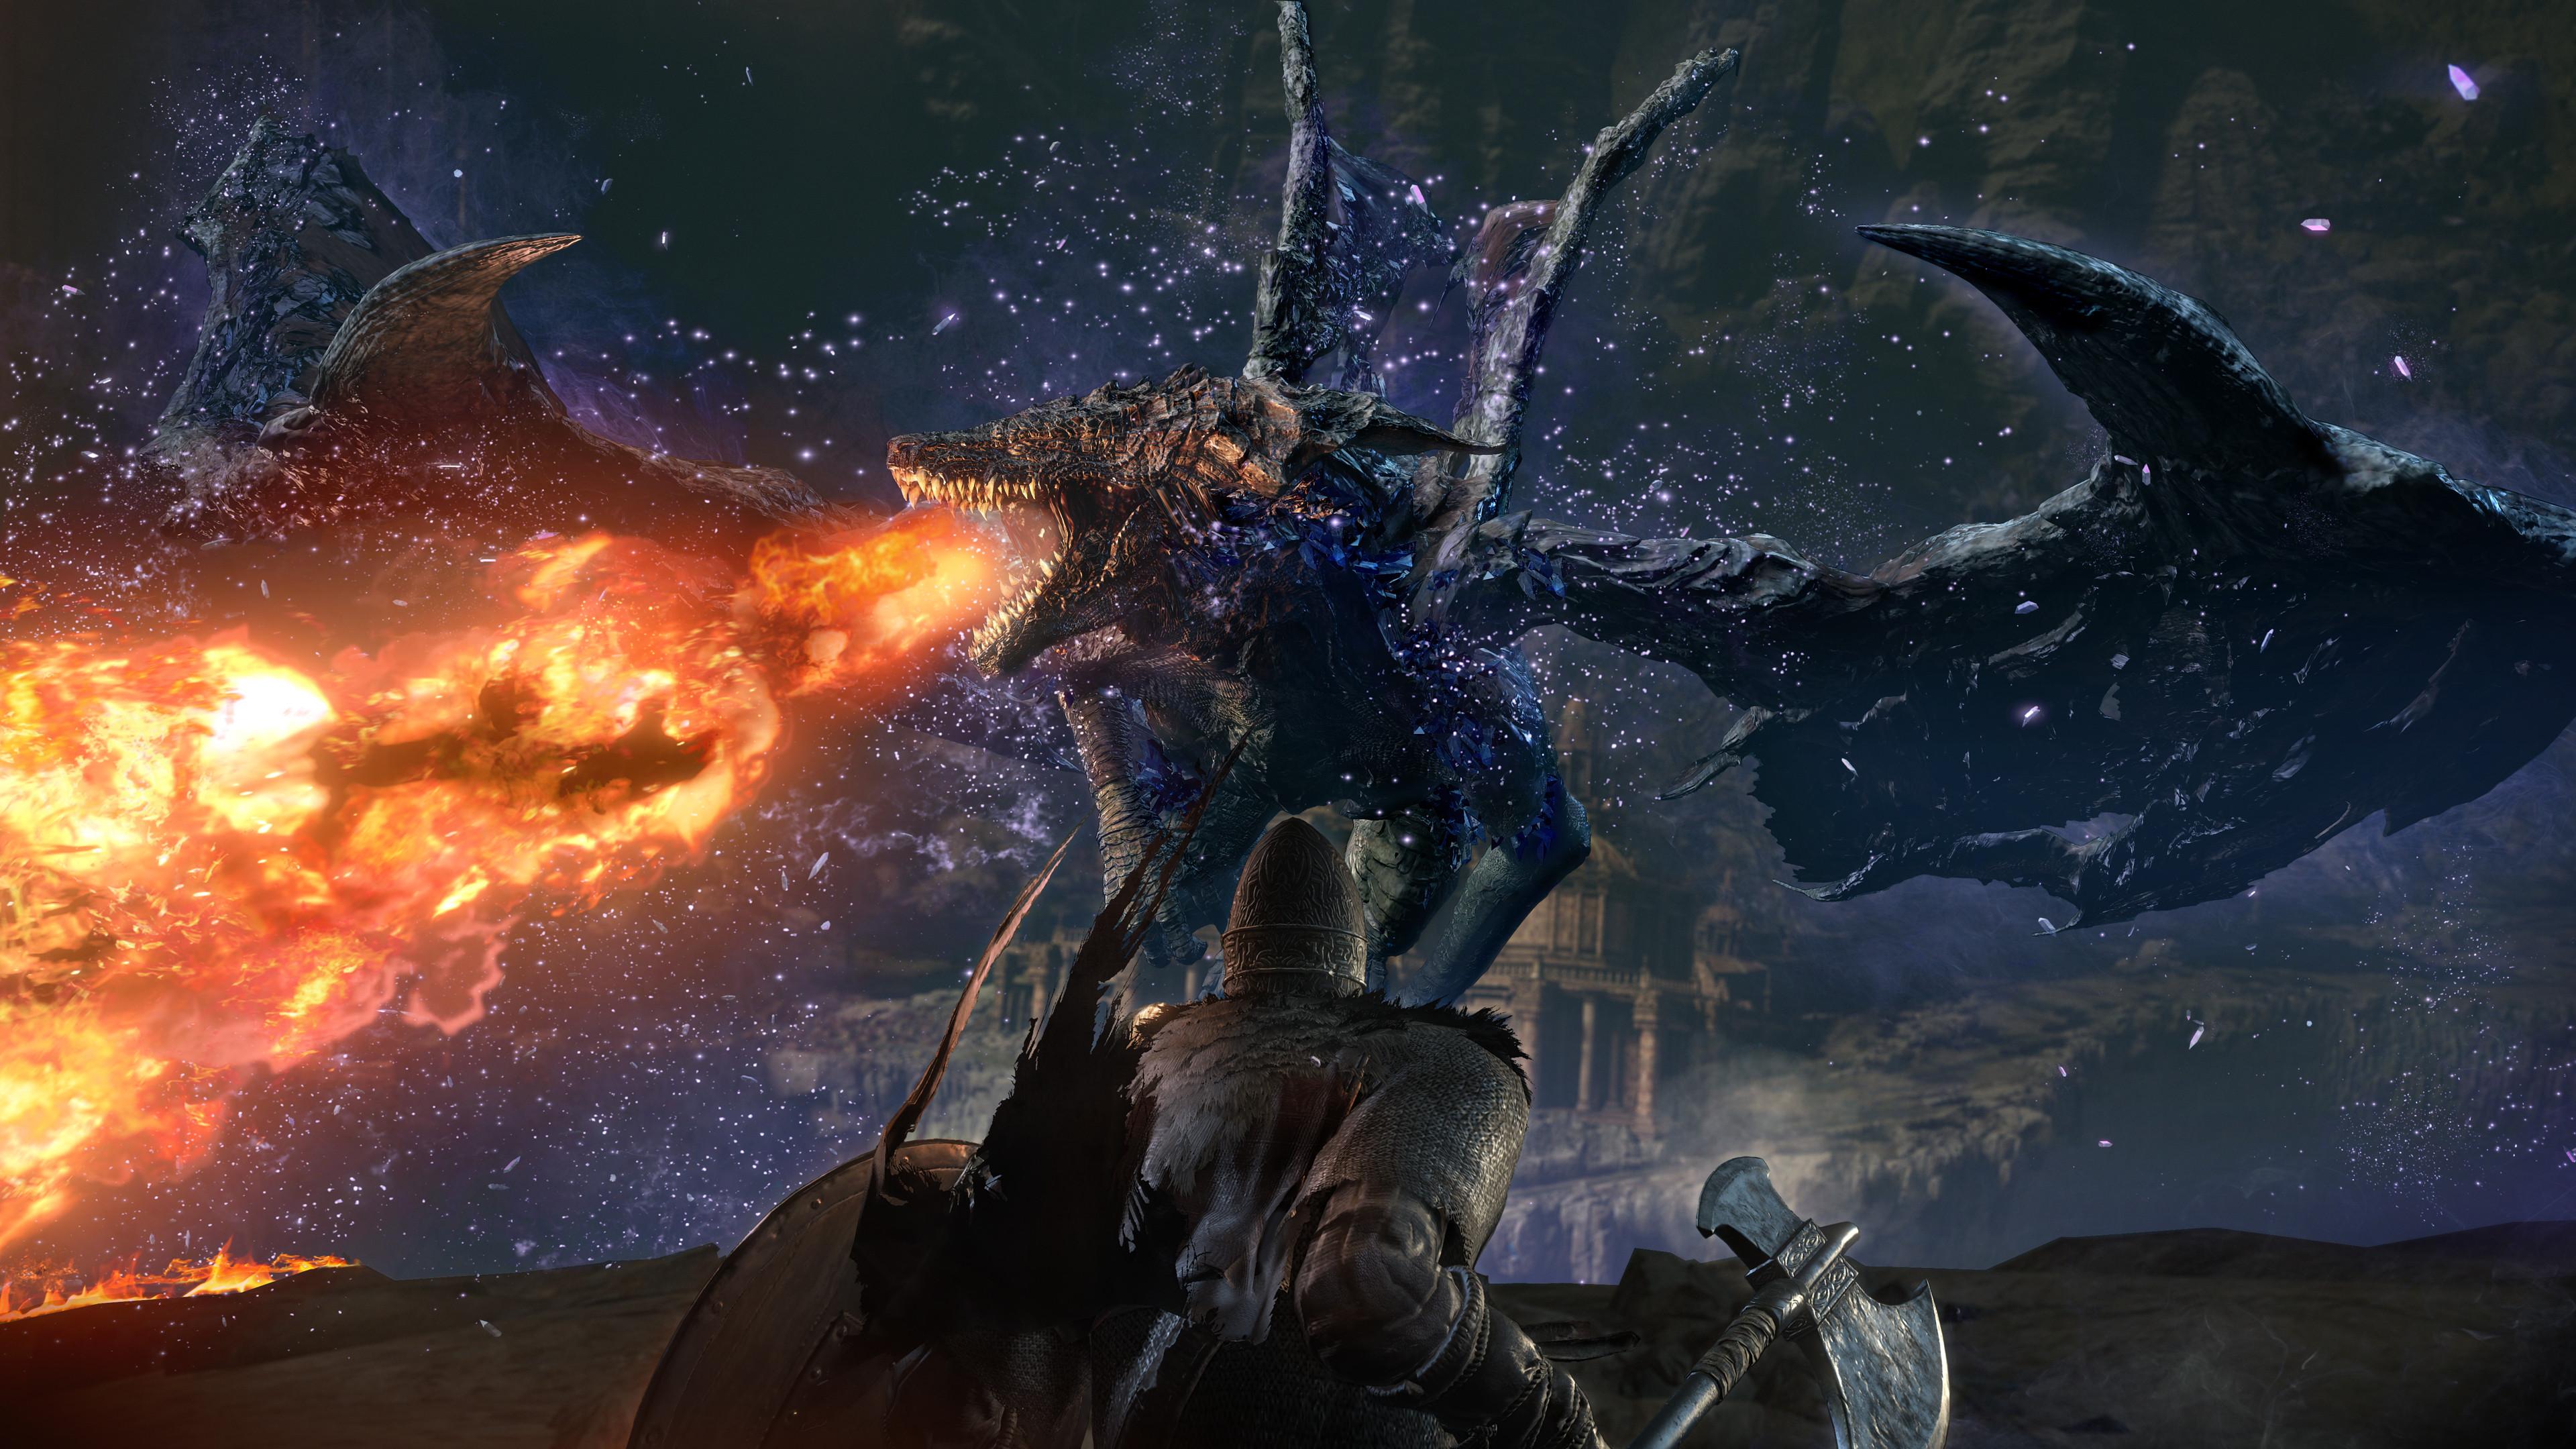 Dark Souls 3 The Ringed City New Screenshots Showcase Fearsome